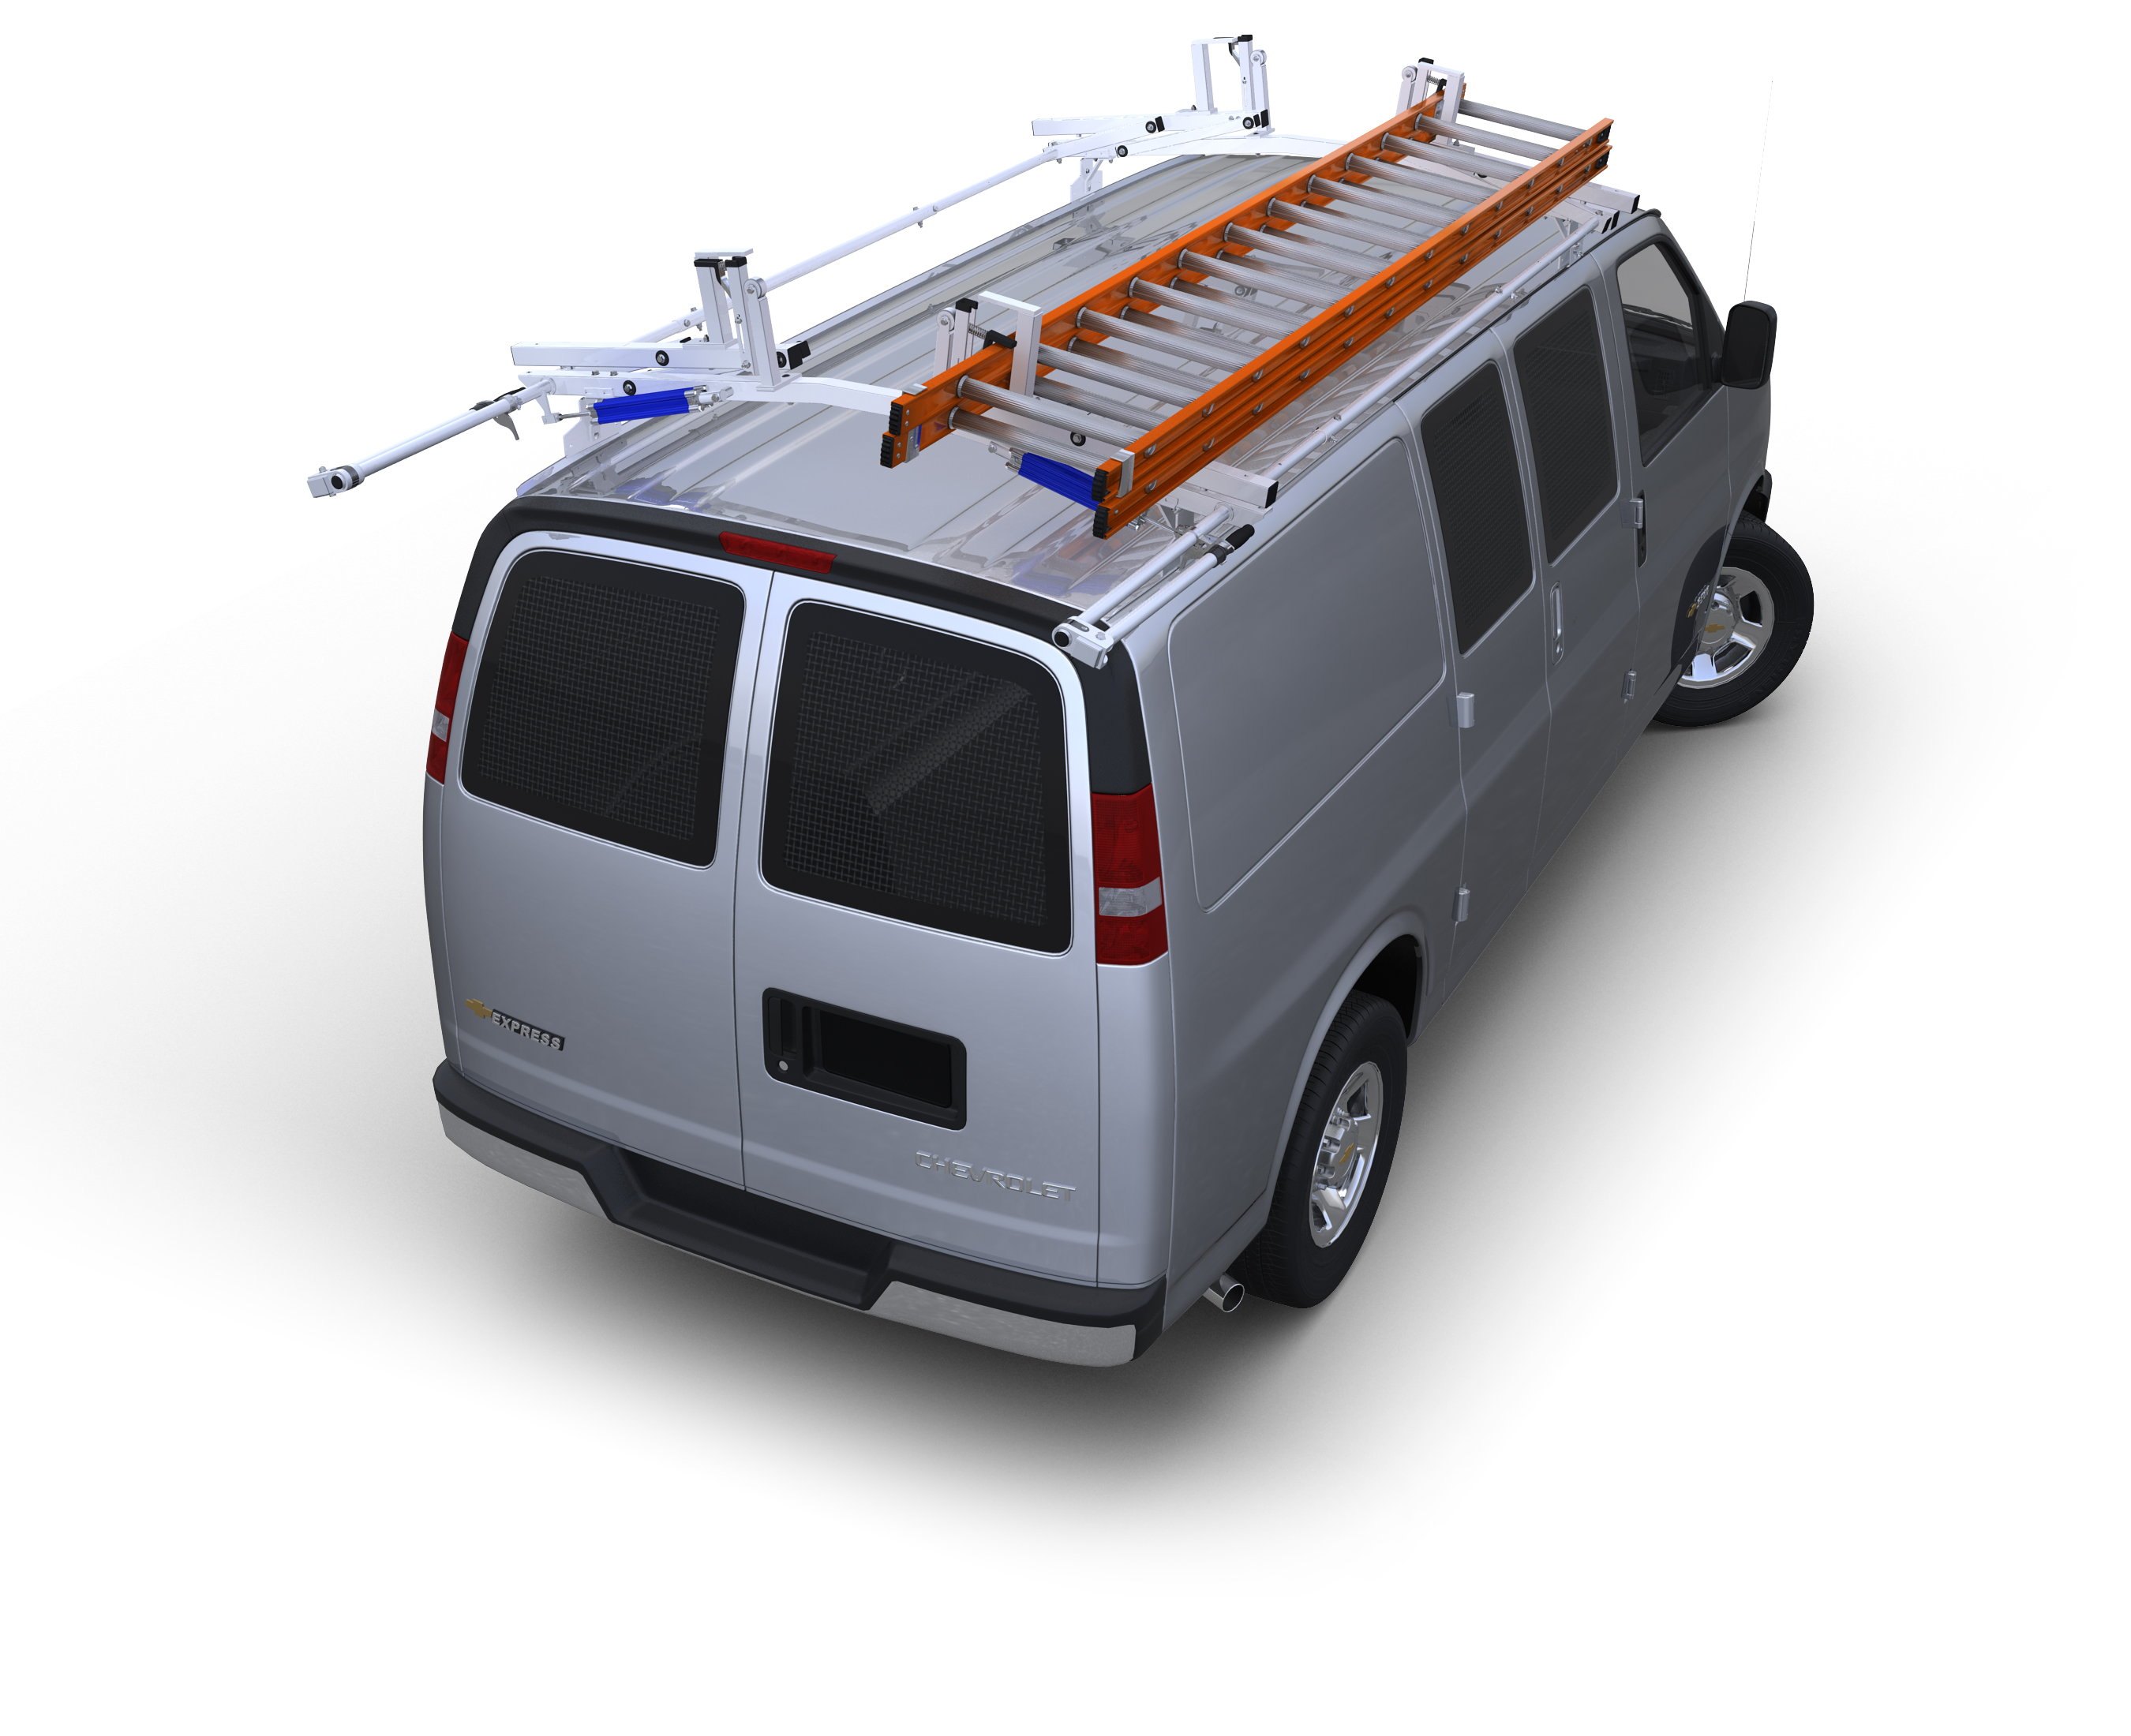 sc 1 st  American Van Equipment & Divider for Self-Stacking Storage Bins - American Van